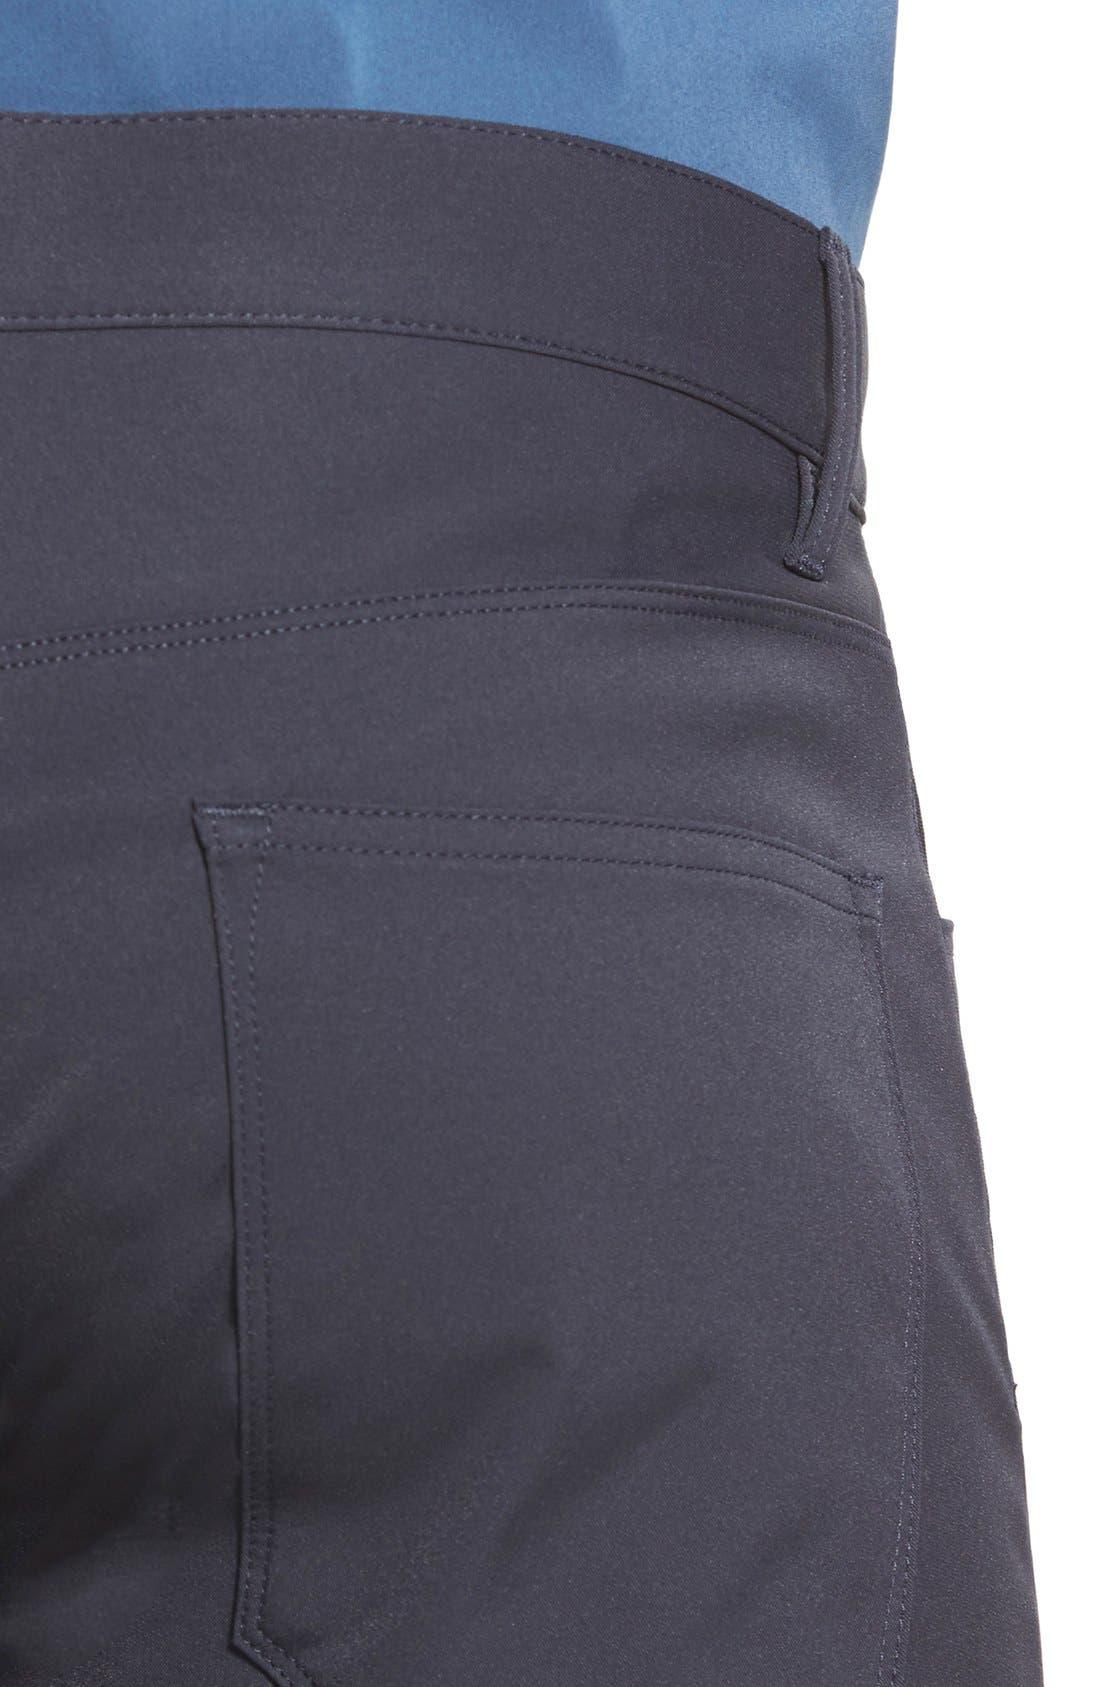 'Zaine Neoteric' Slim Fit Pants,                             Alternate thumbnail 32, color,